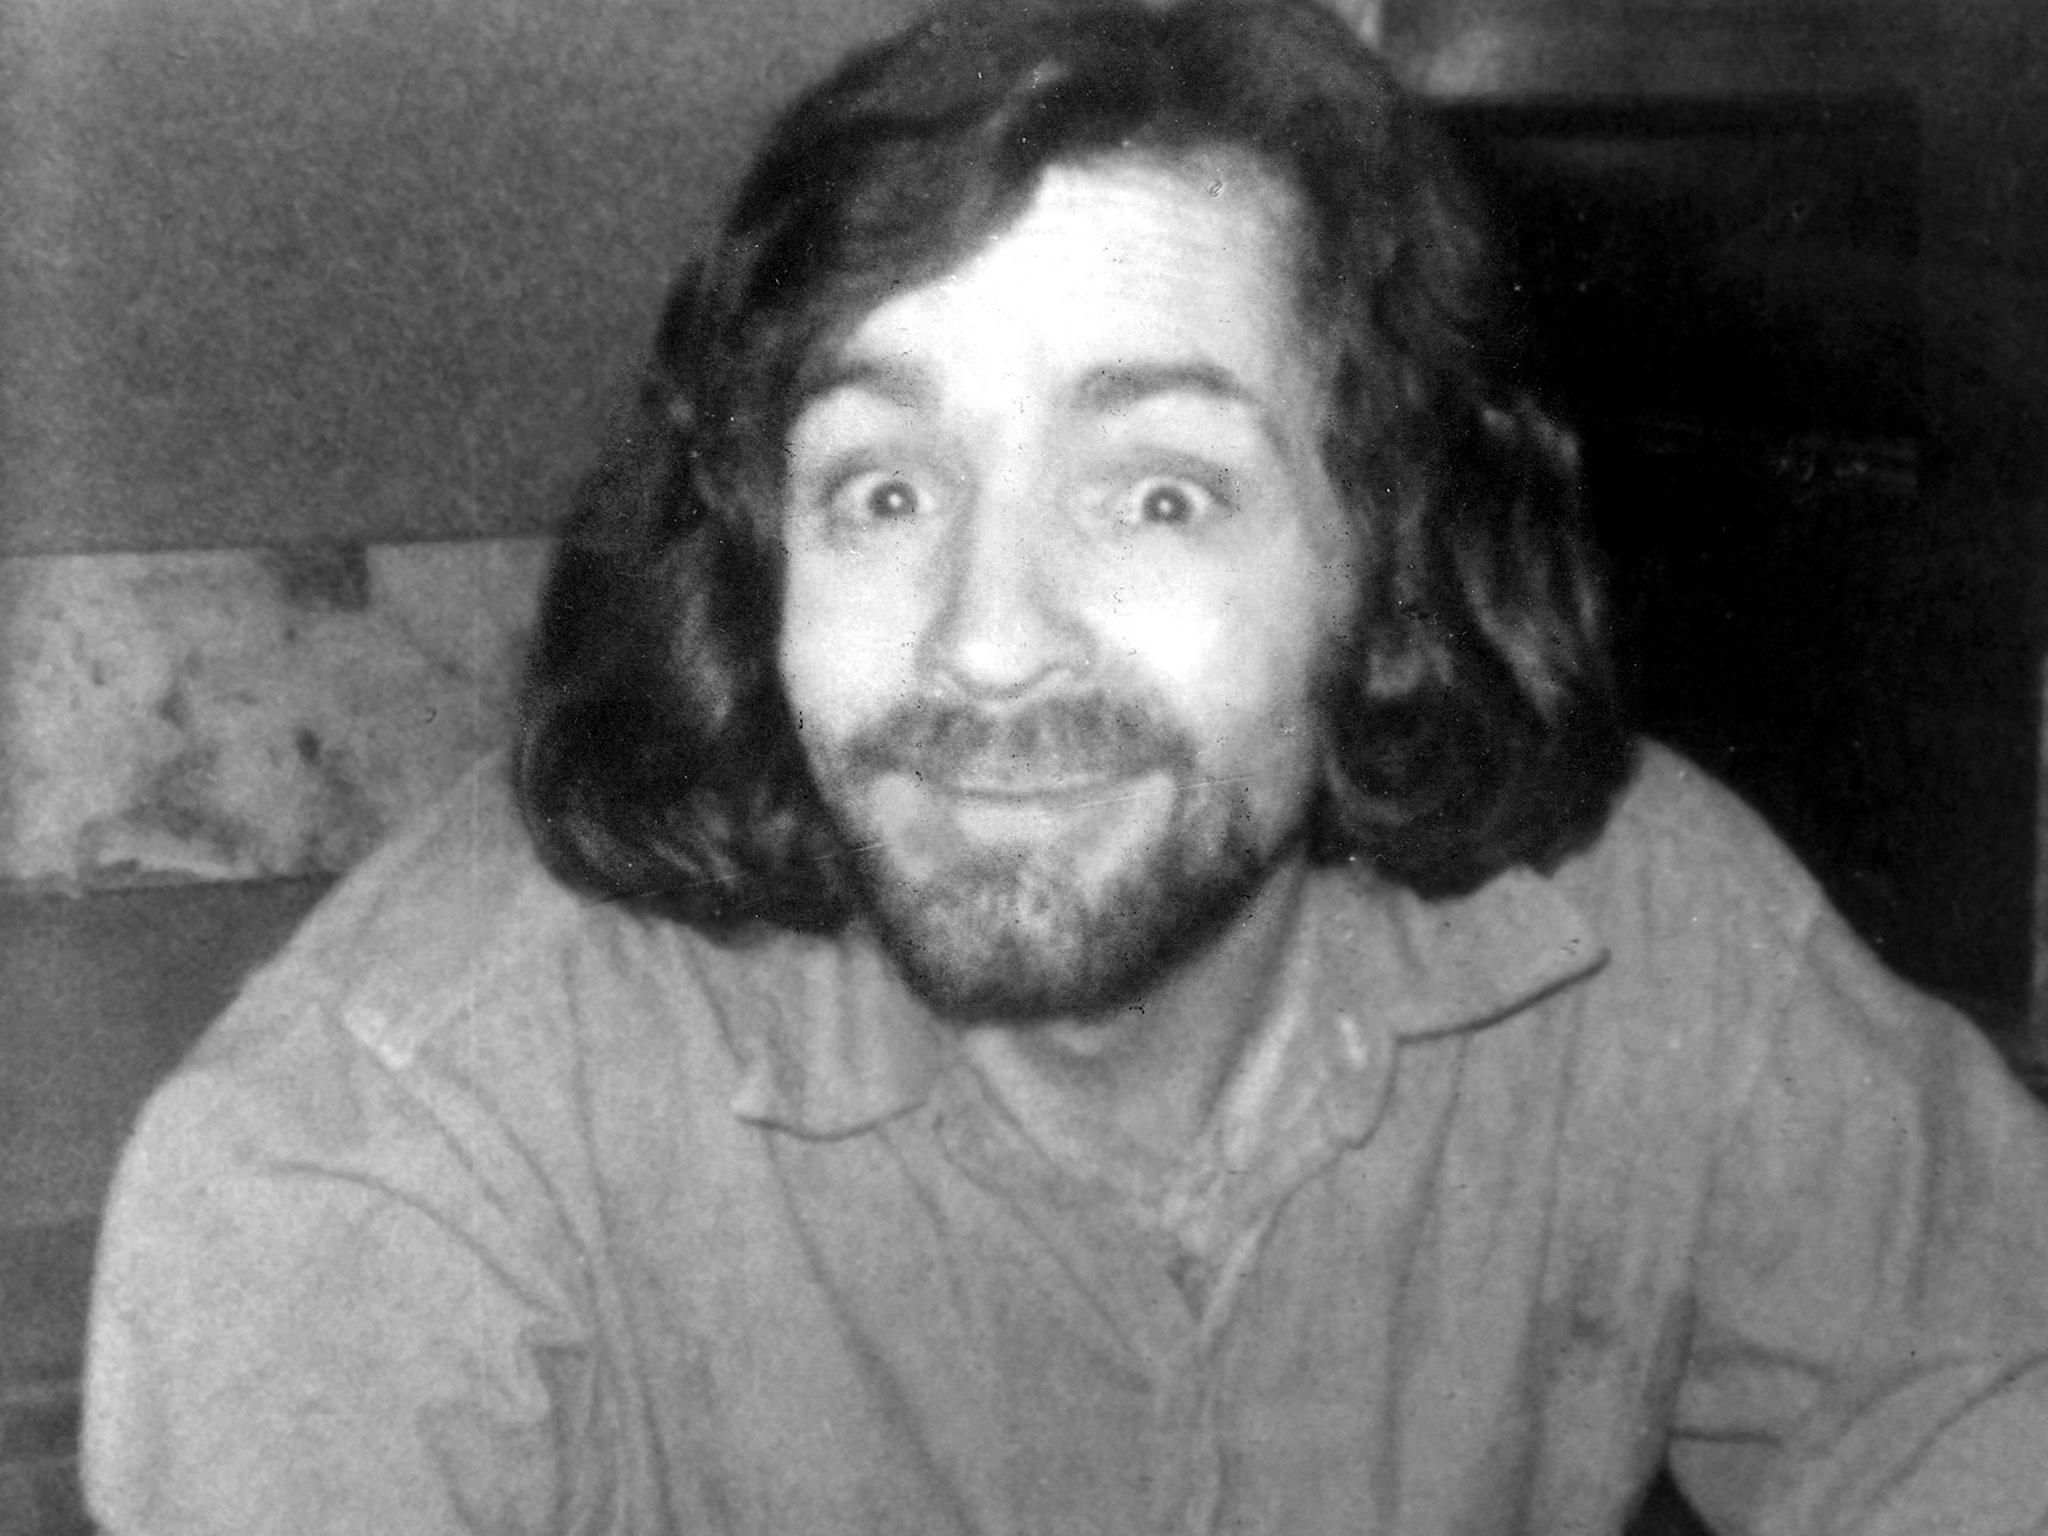 Charles 'Tex' Watson: Charles Manson family member sends